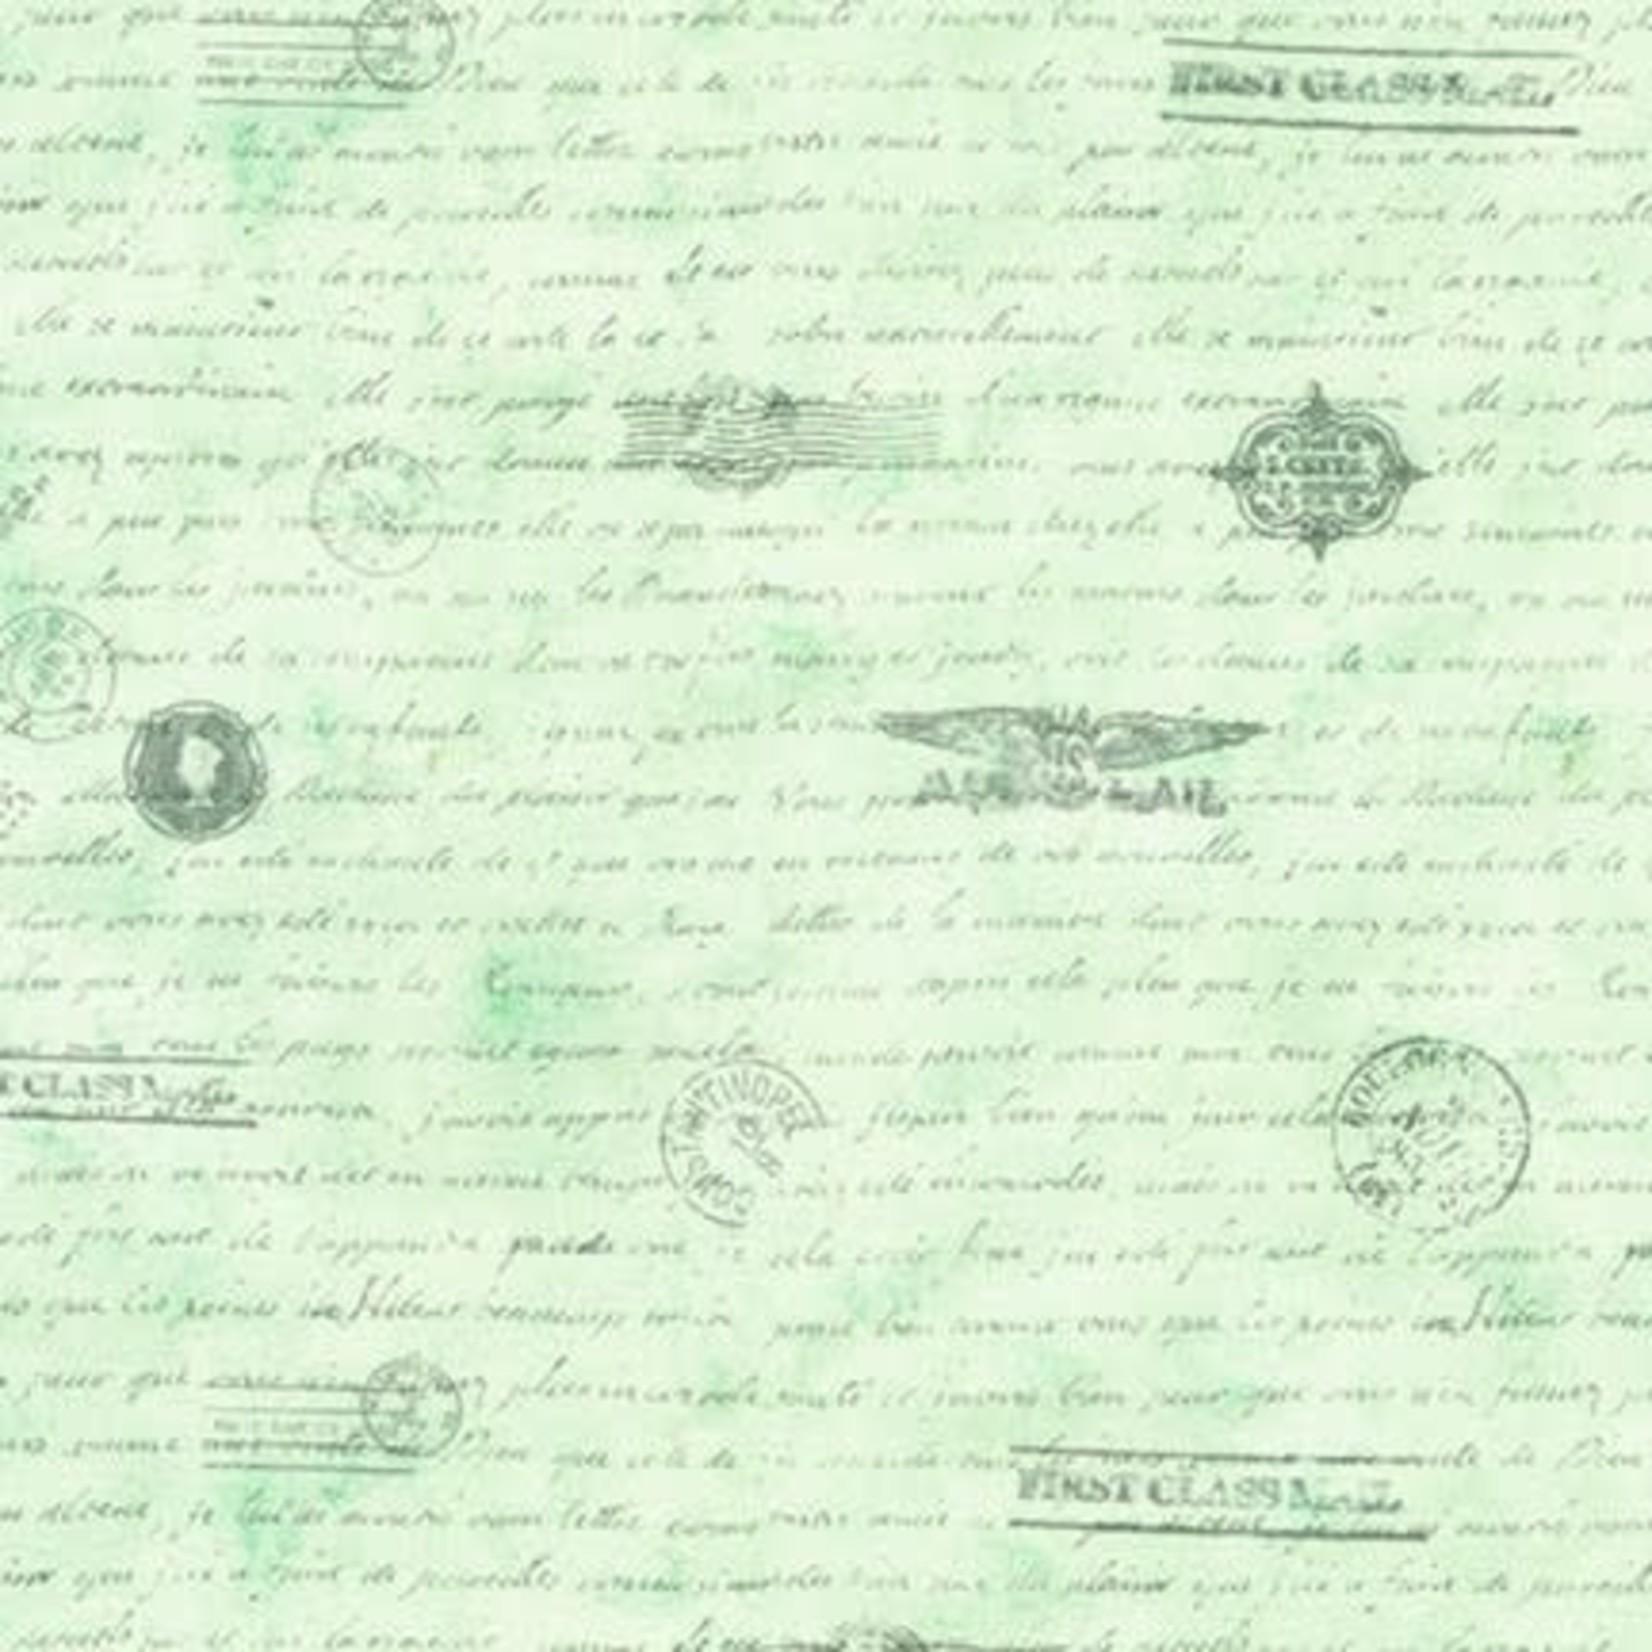 Robert Kaufman Library of Rarities, Air Mail, Parakeet, per cm or $20/m